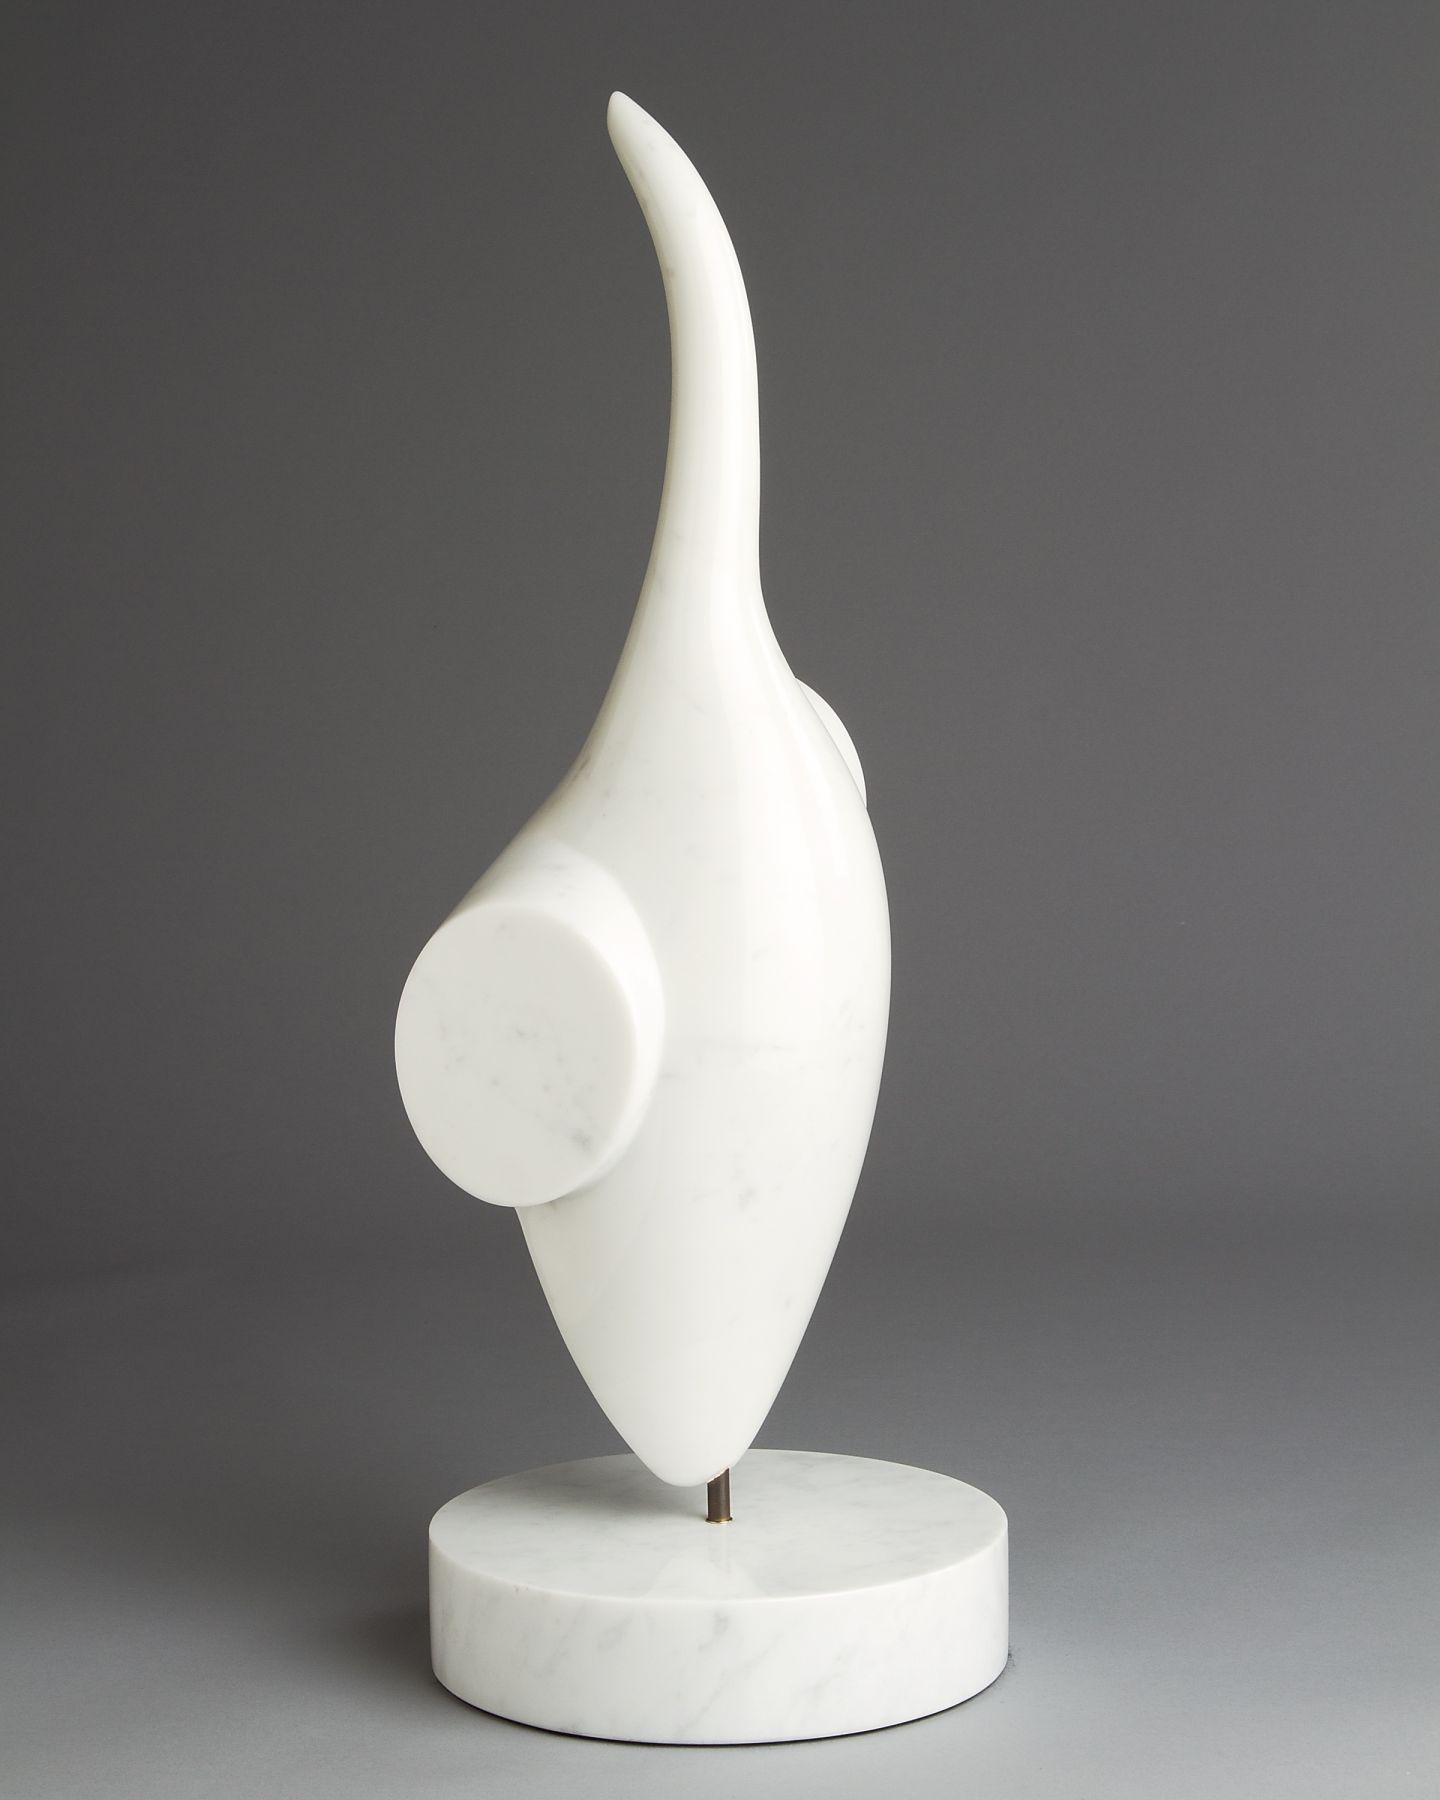 Charlie Kaplan, White Pointer, 2000, side view